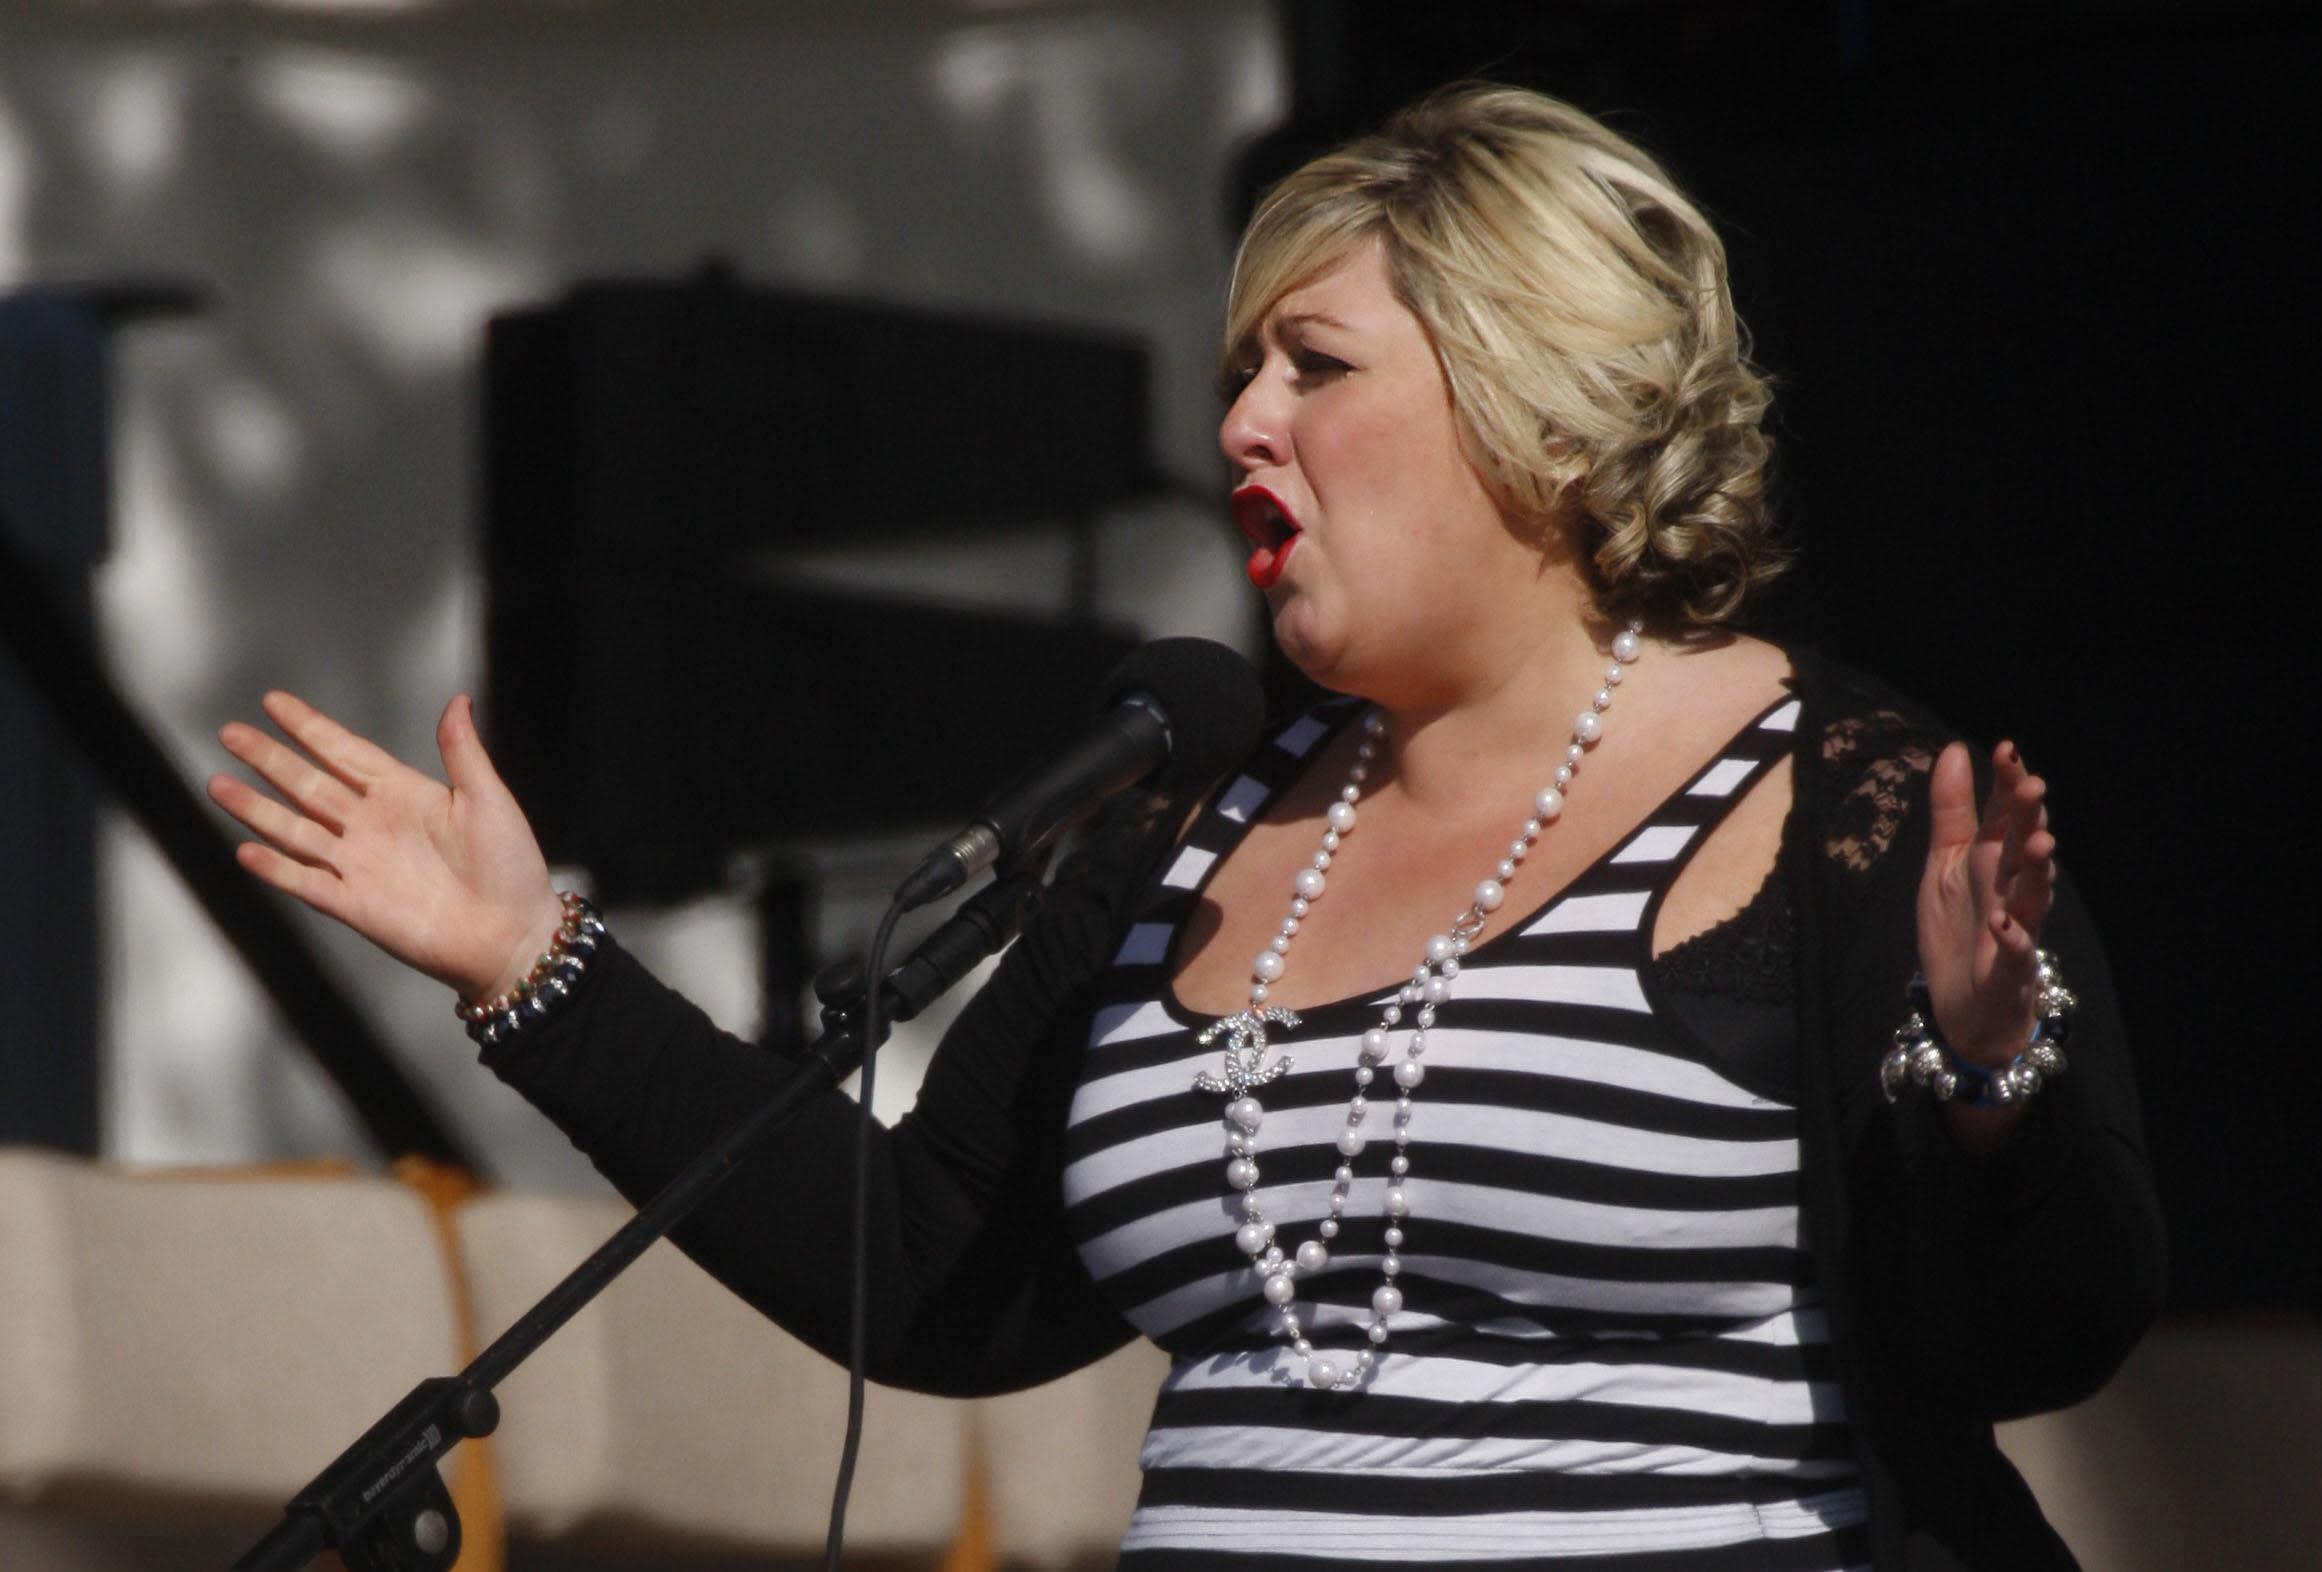 'Pop Idol' winner Michelle McManus announces pregnancy